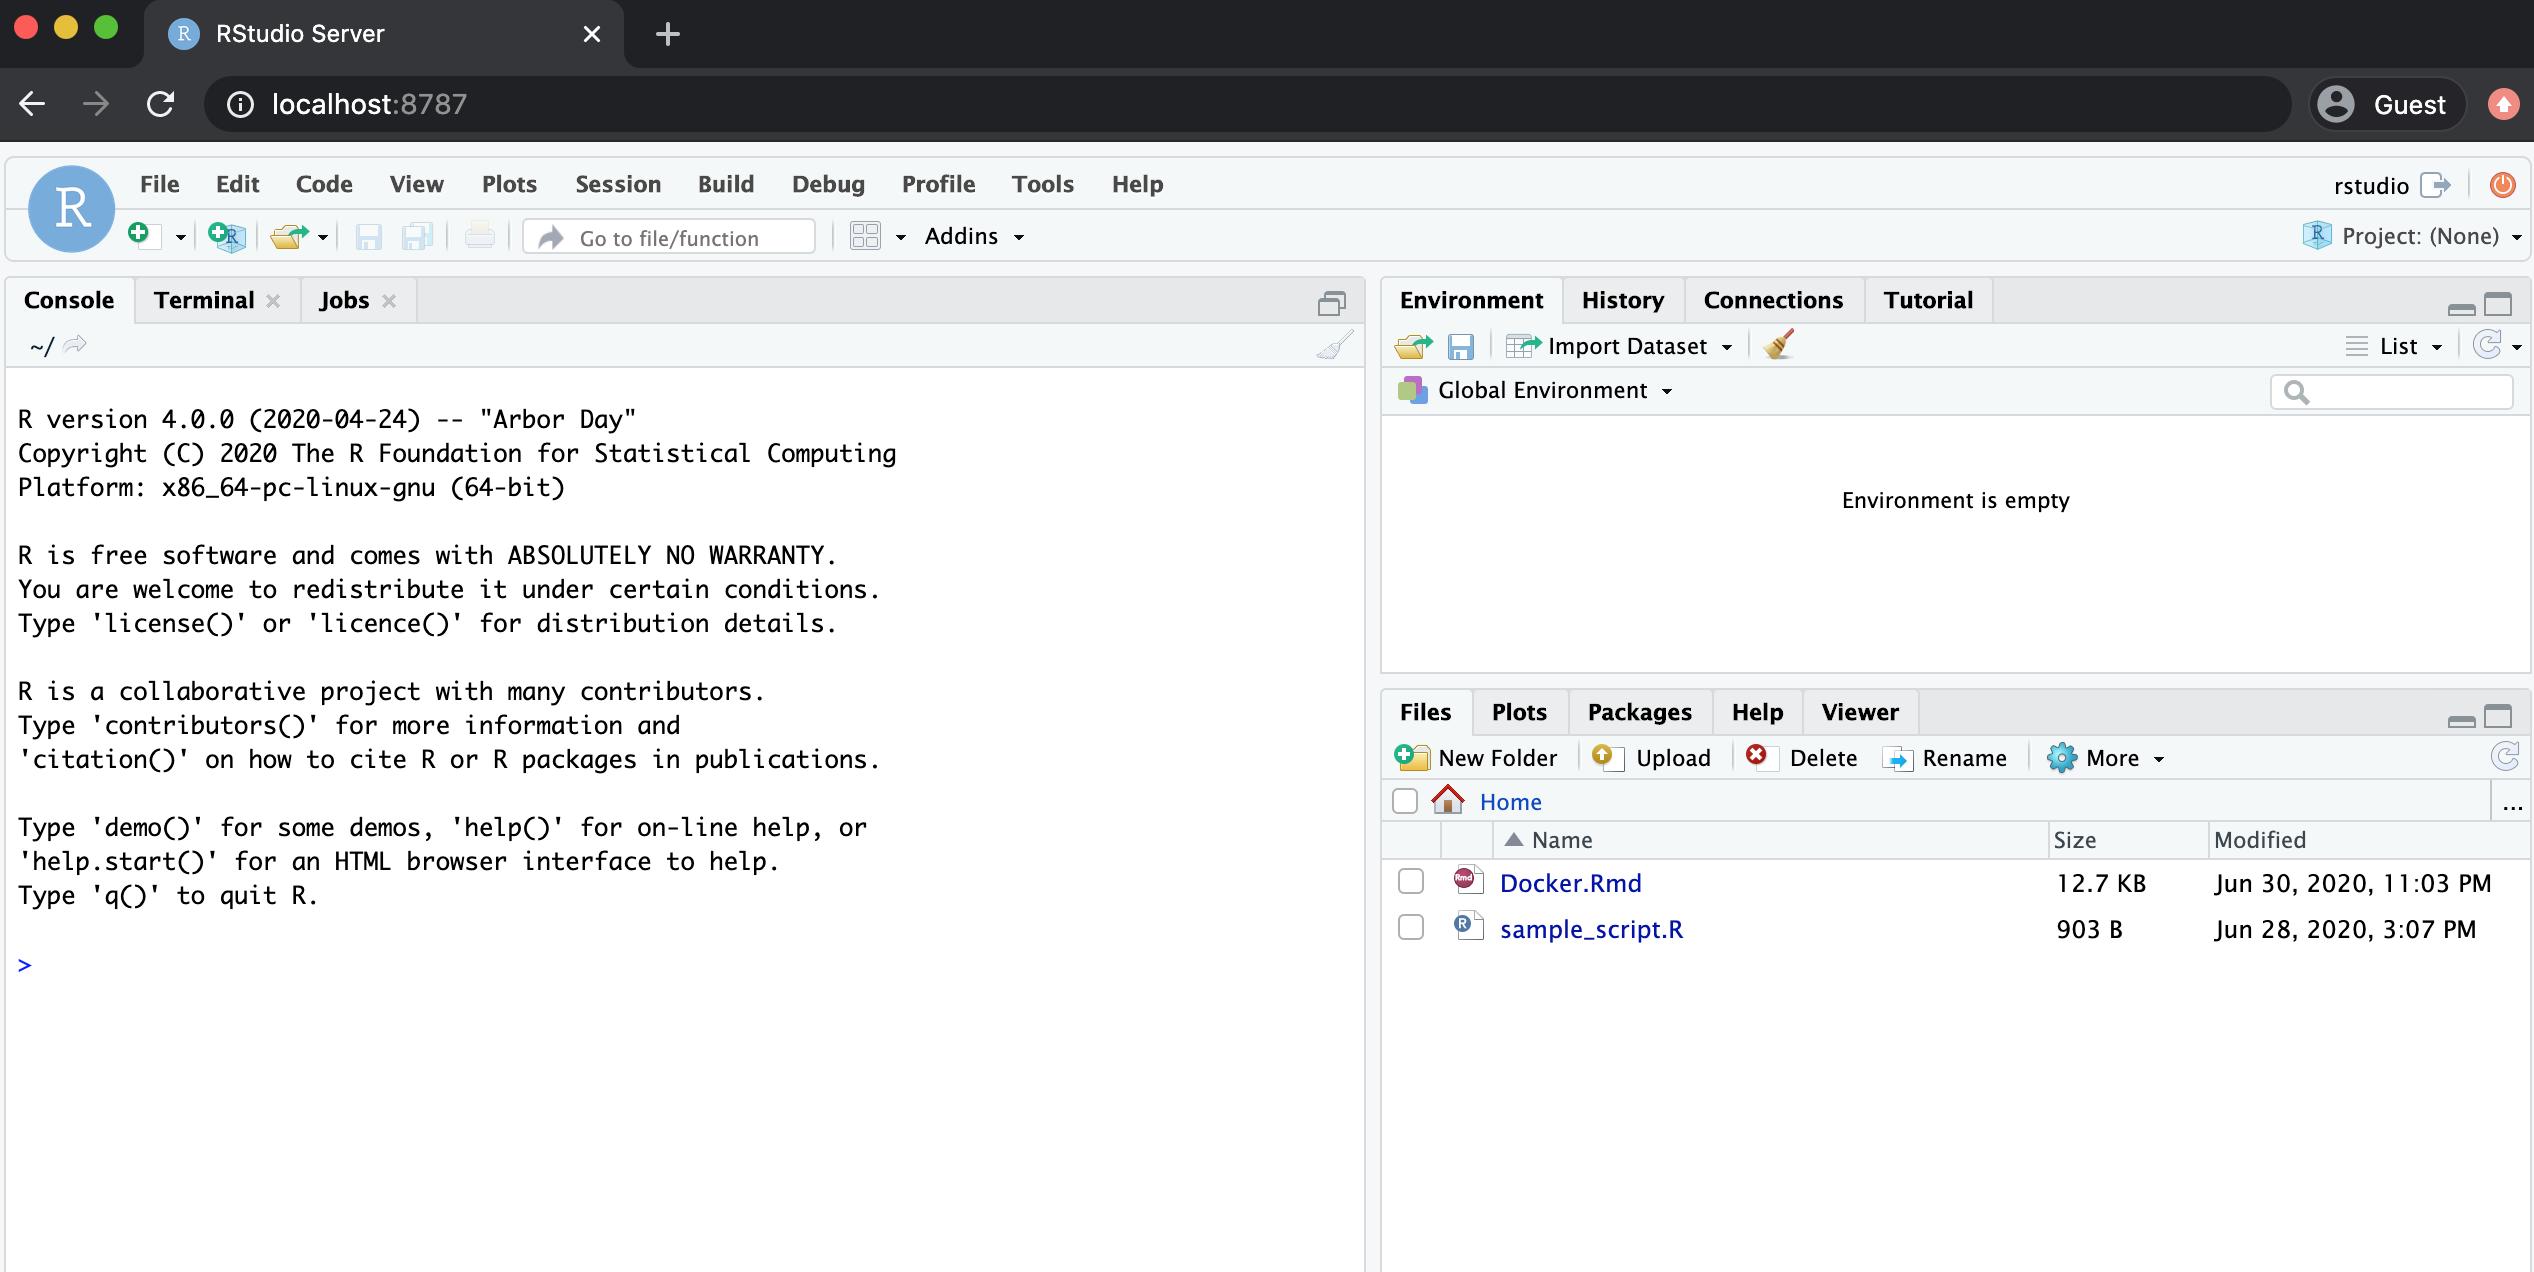 Sharing And Running R Code Using Docker